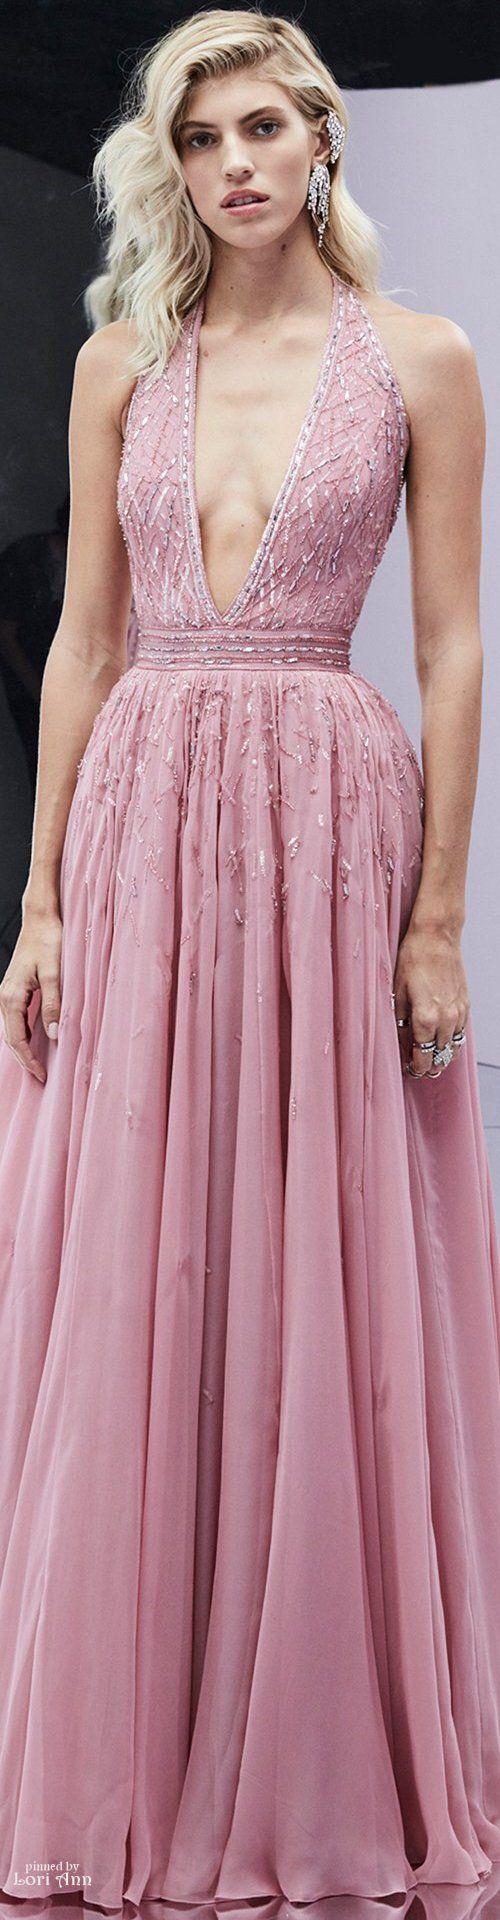 1306 best Dress to impress images on Pinterest | High fashion ...